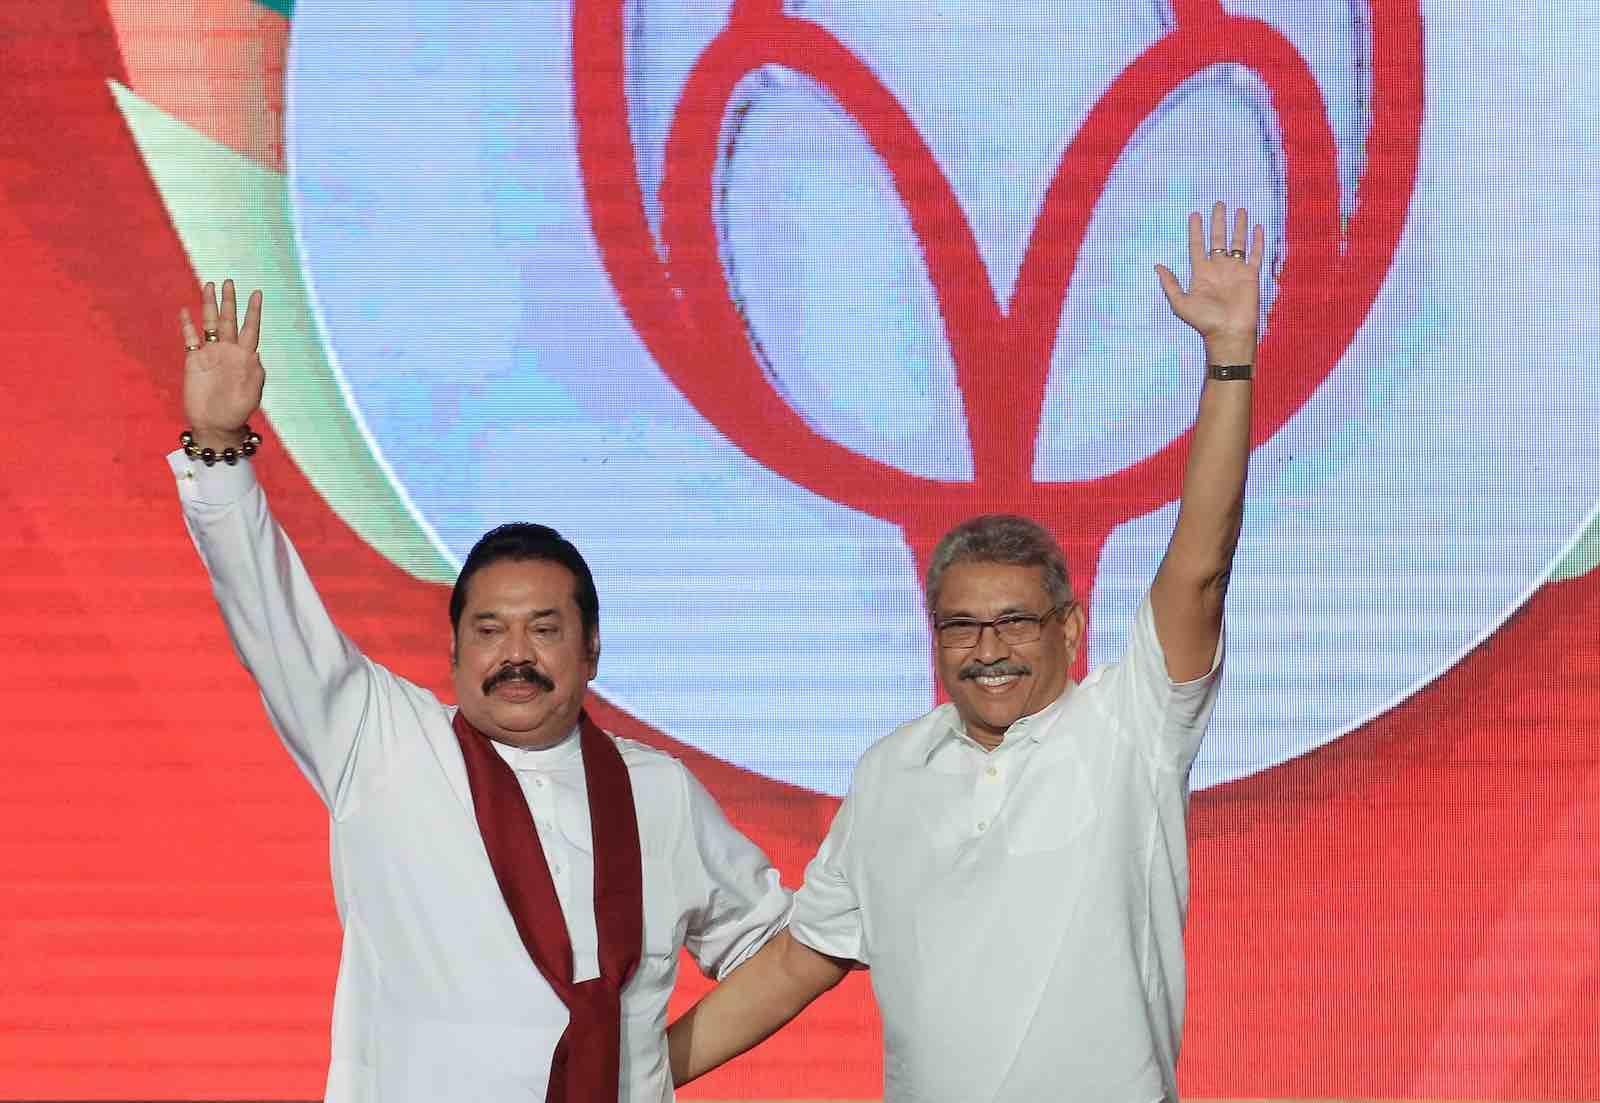 Former Sri Lankan president Mahinda Rajapaksa (L) with brother and presidential candidate Gotabaya Rajapaksa, Colombo, Sri Lanka, 11 August 2019. (Photo: Tharaka Basnayaka via Getty)